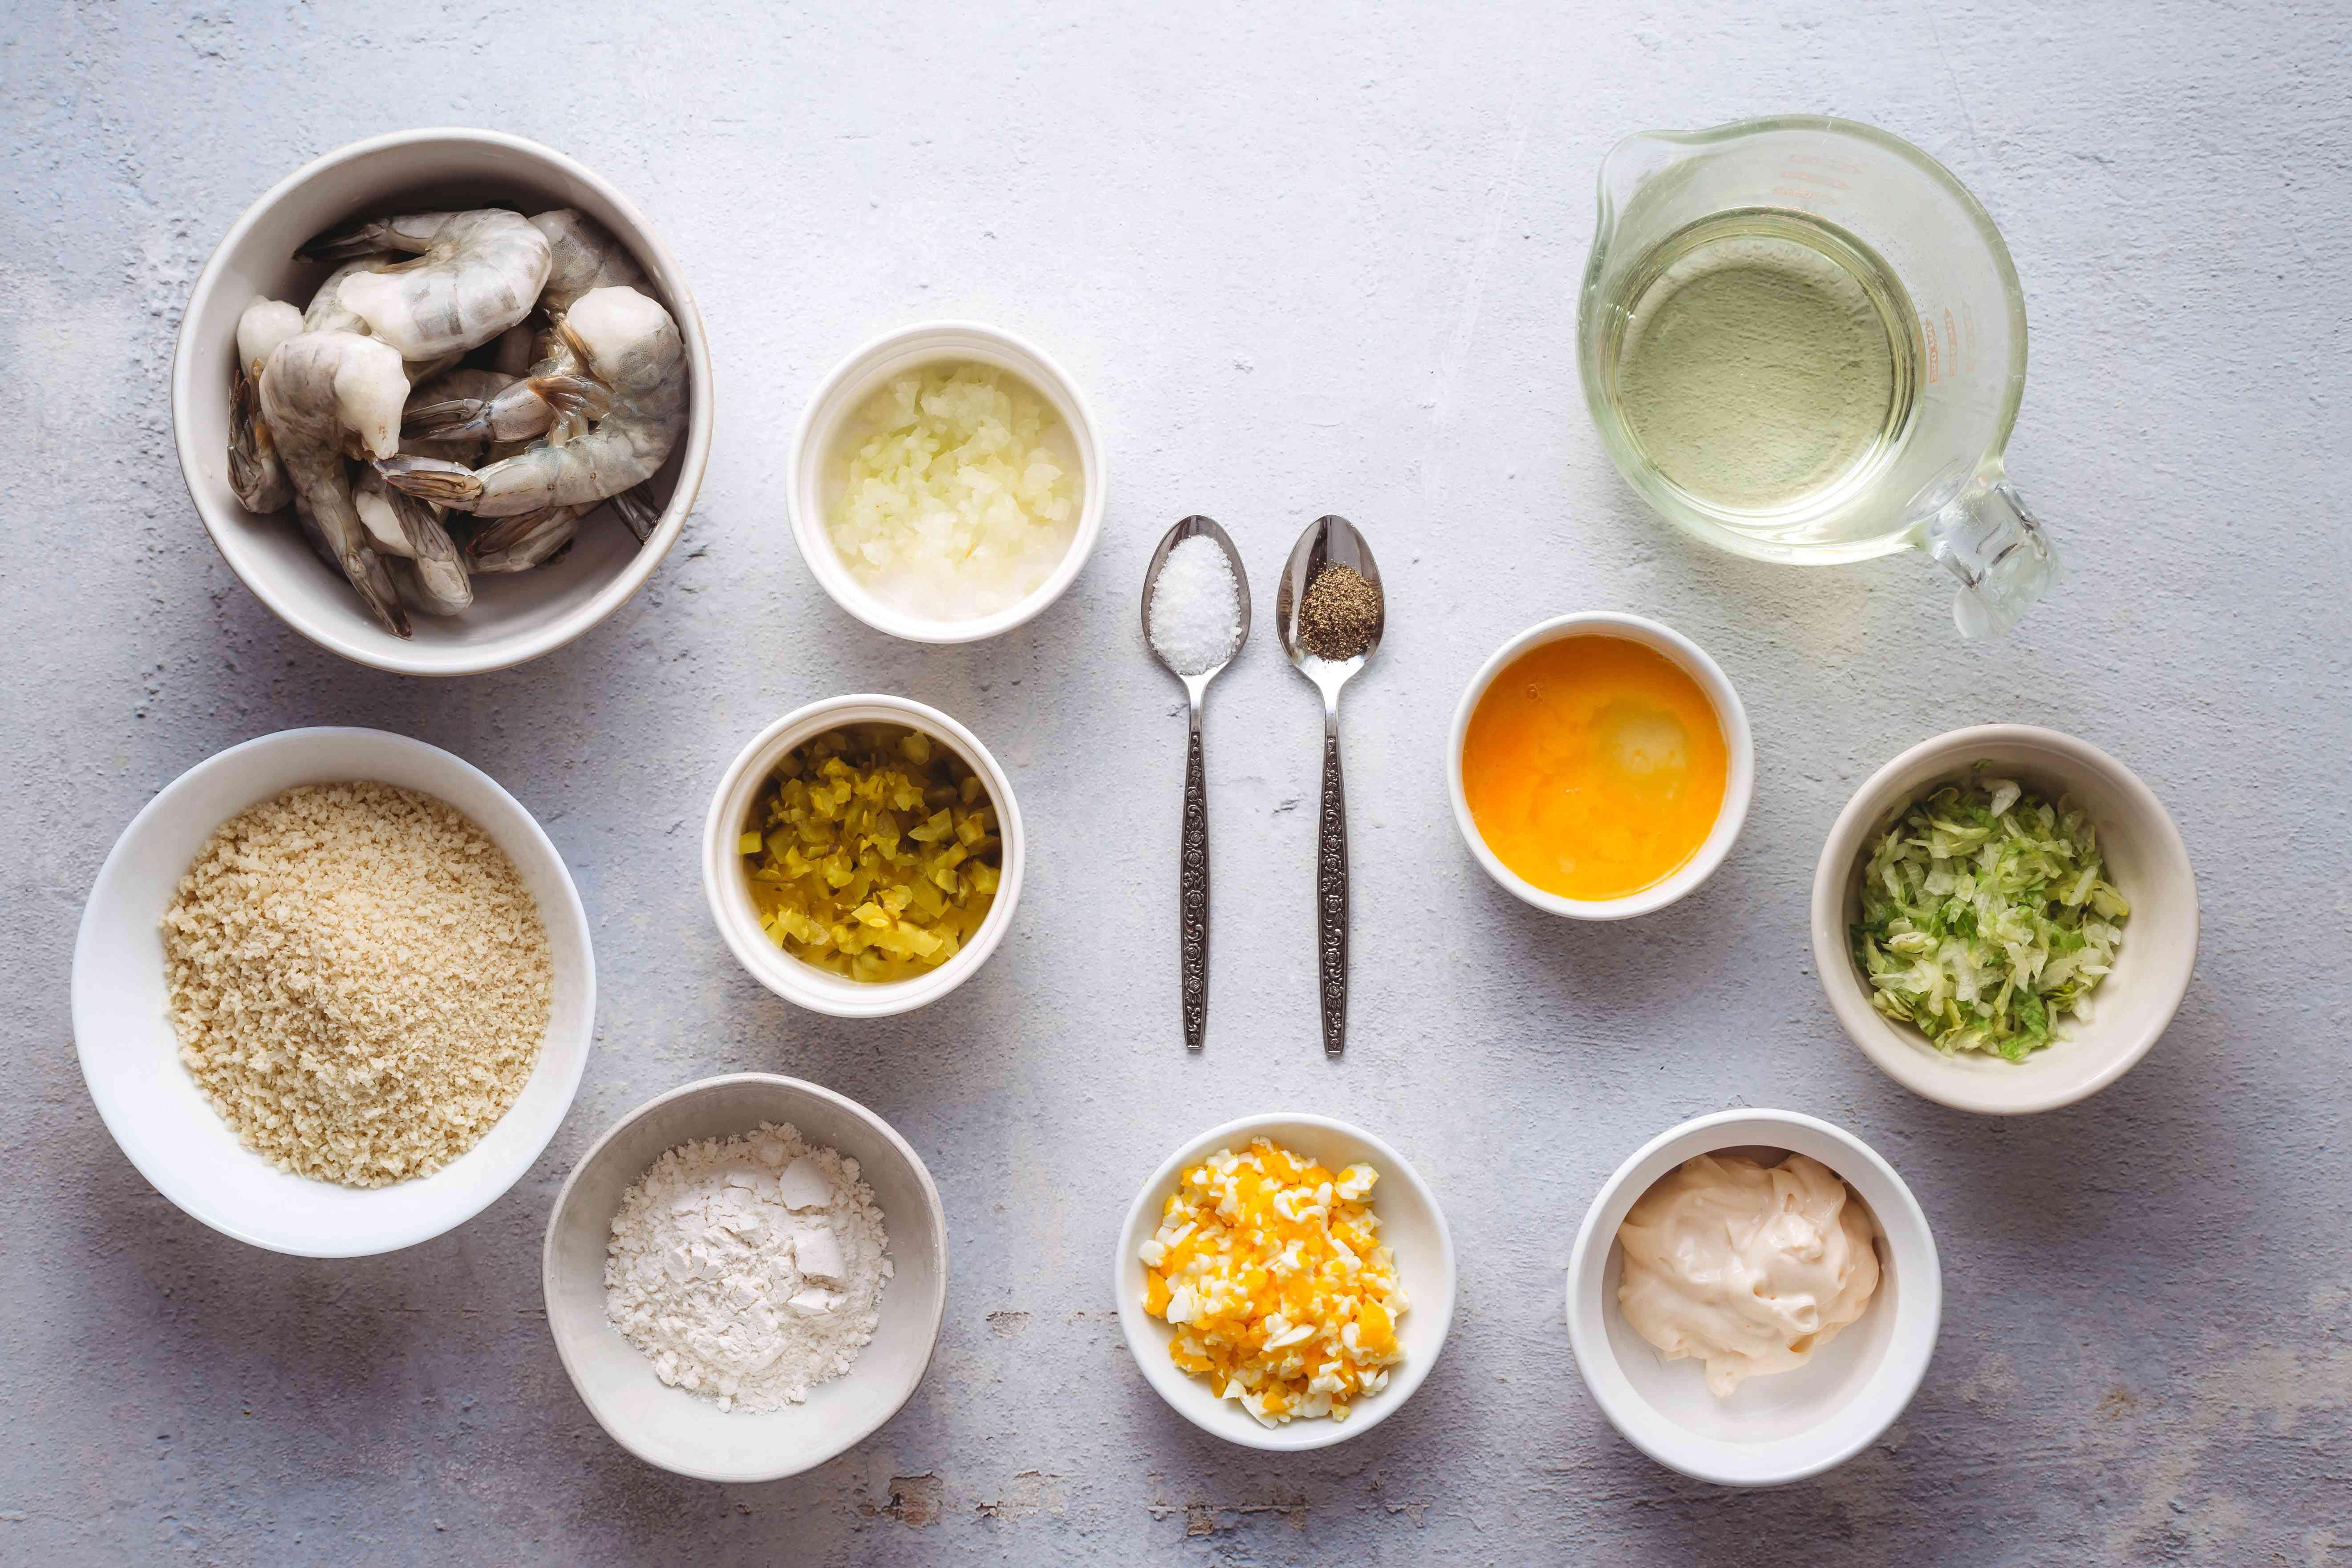 Ebi Fry (Fried Shrimp) ingredients